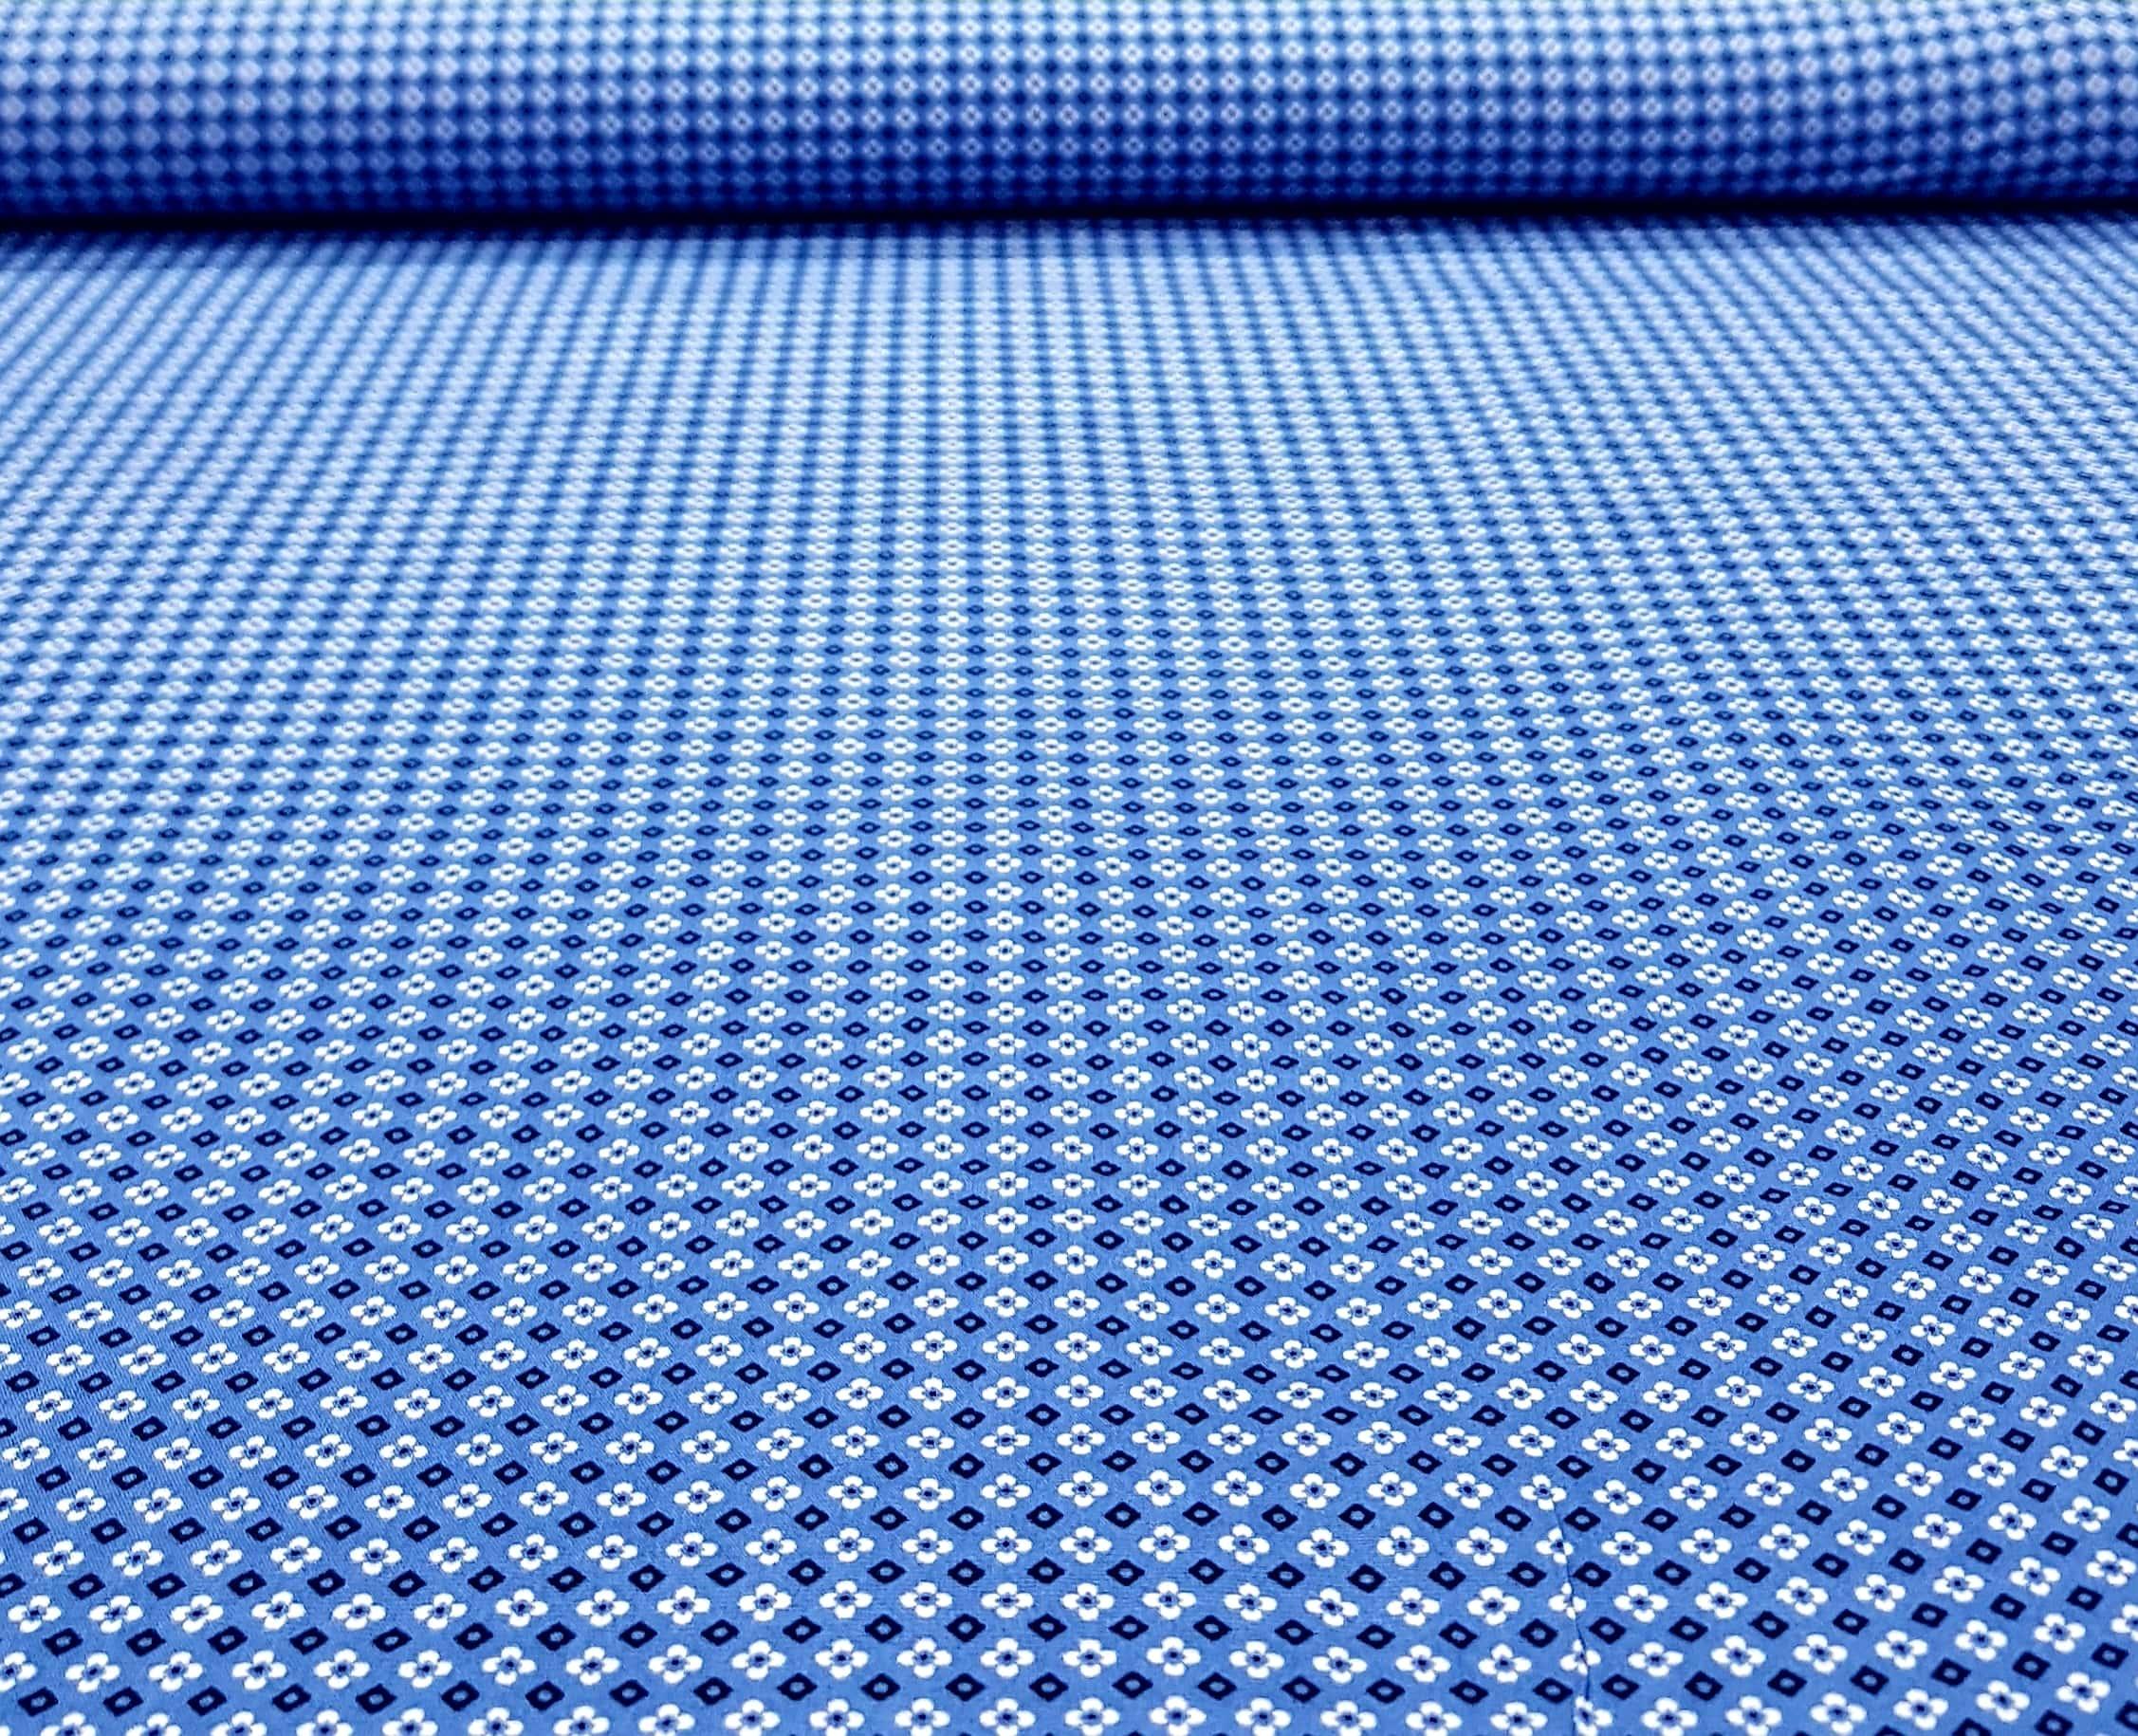 kinderkatoenbloemenruitblauw-min